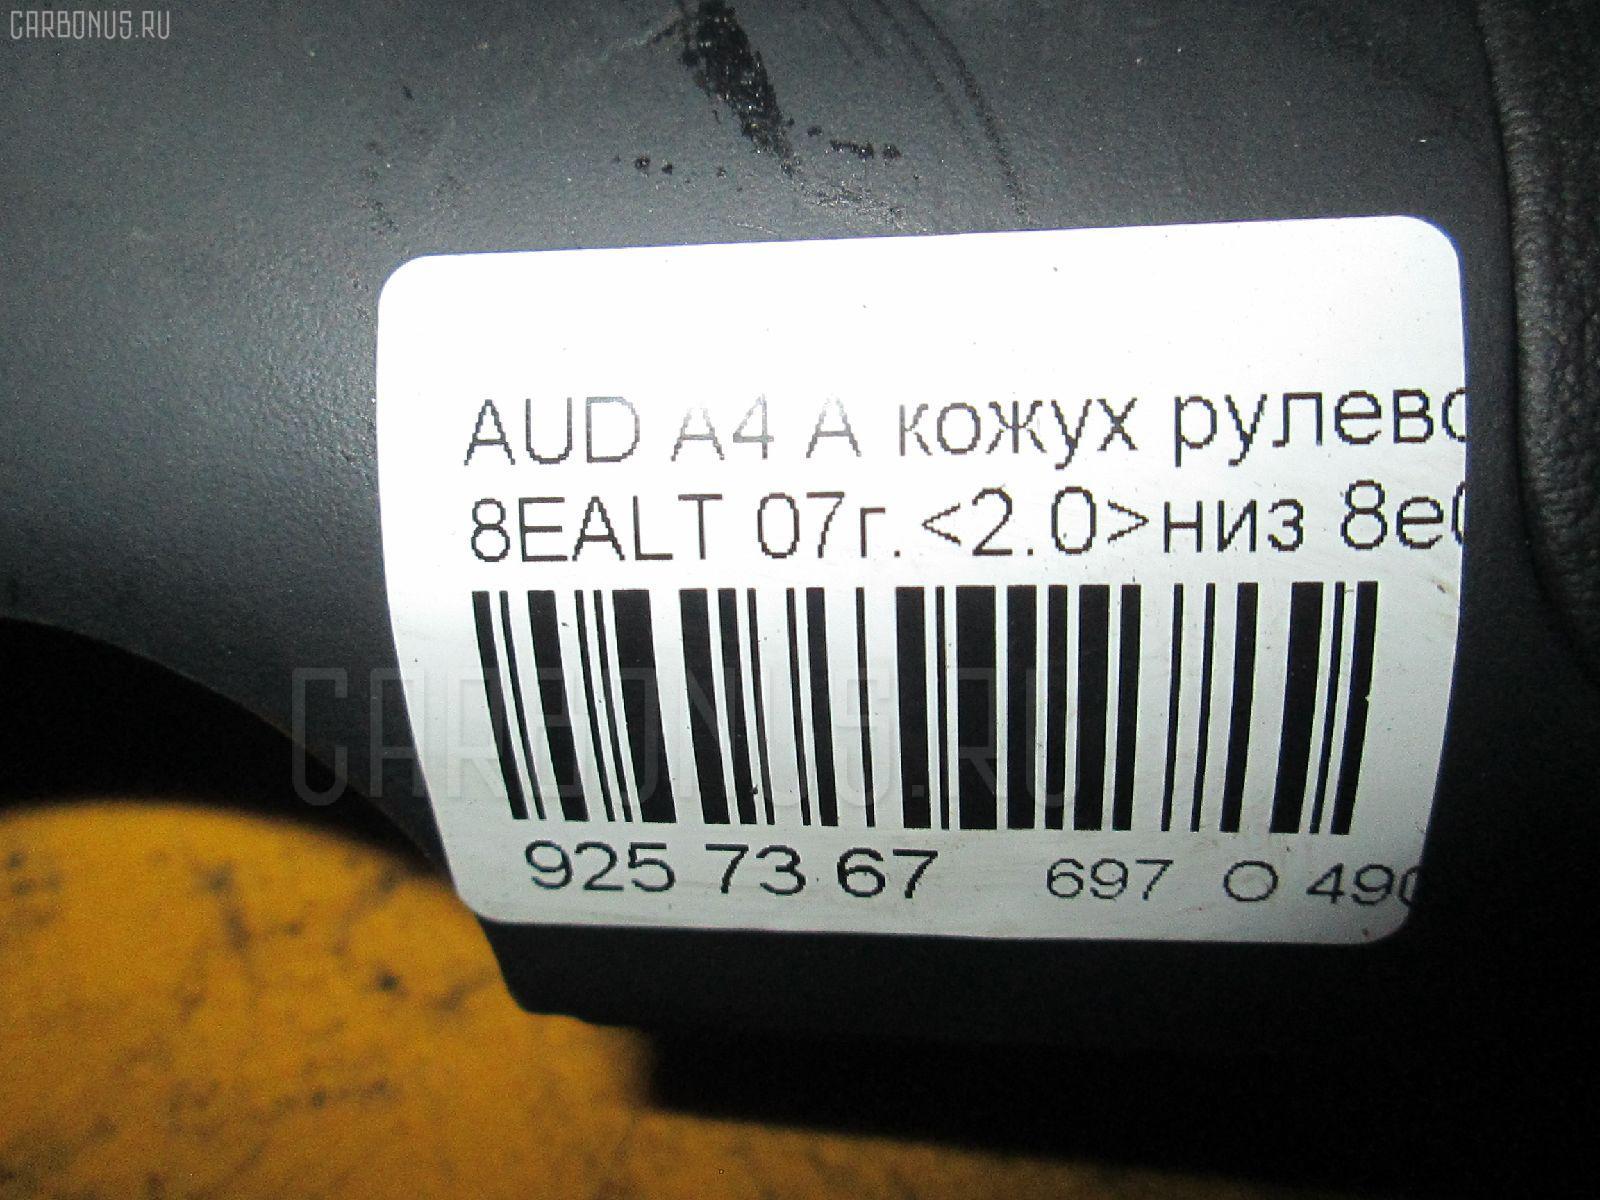 Кожух рулевой колонки AUDI A4 AVANT 8EALT Фото 3